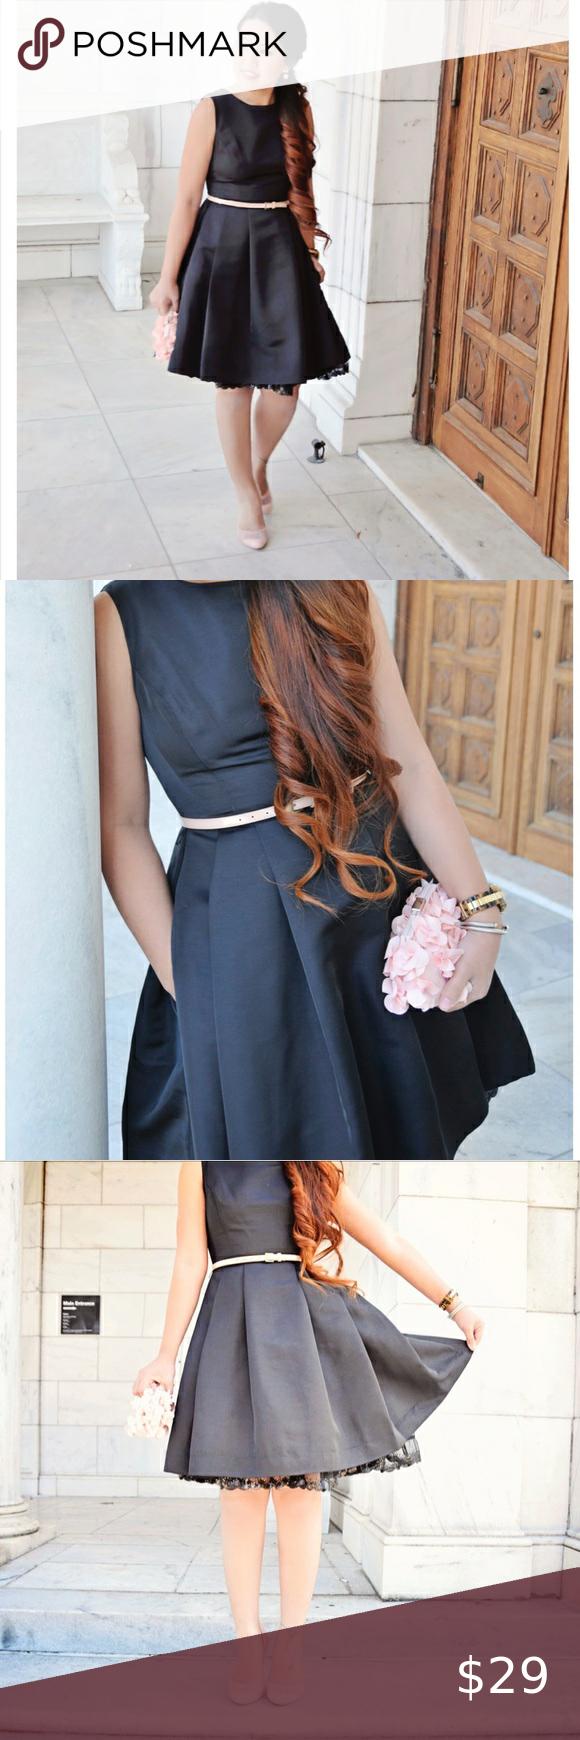 Jason Wu For Target Black Fit Flare Dress Sz 12 Fit Flare Dress Flare Dress Clothes Design [ 1740 x 580 Pixel ]